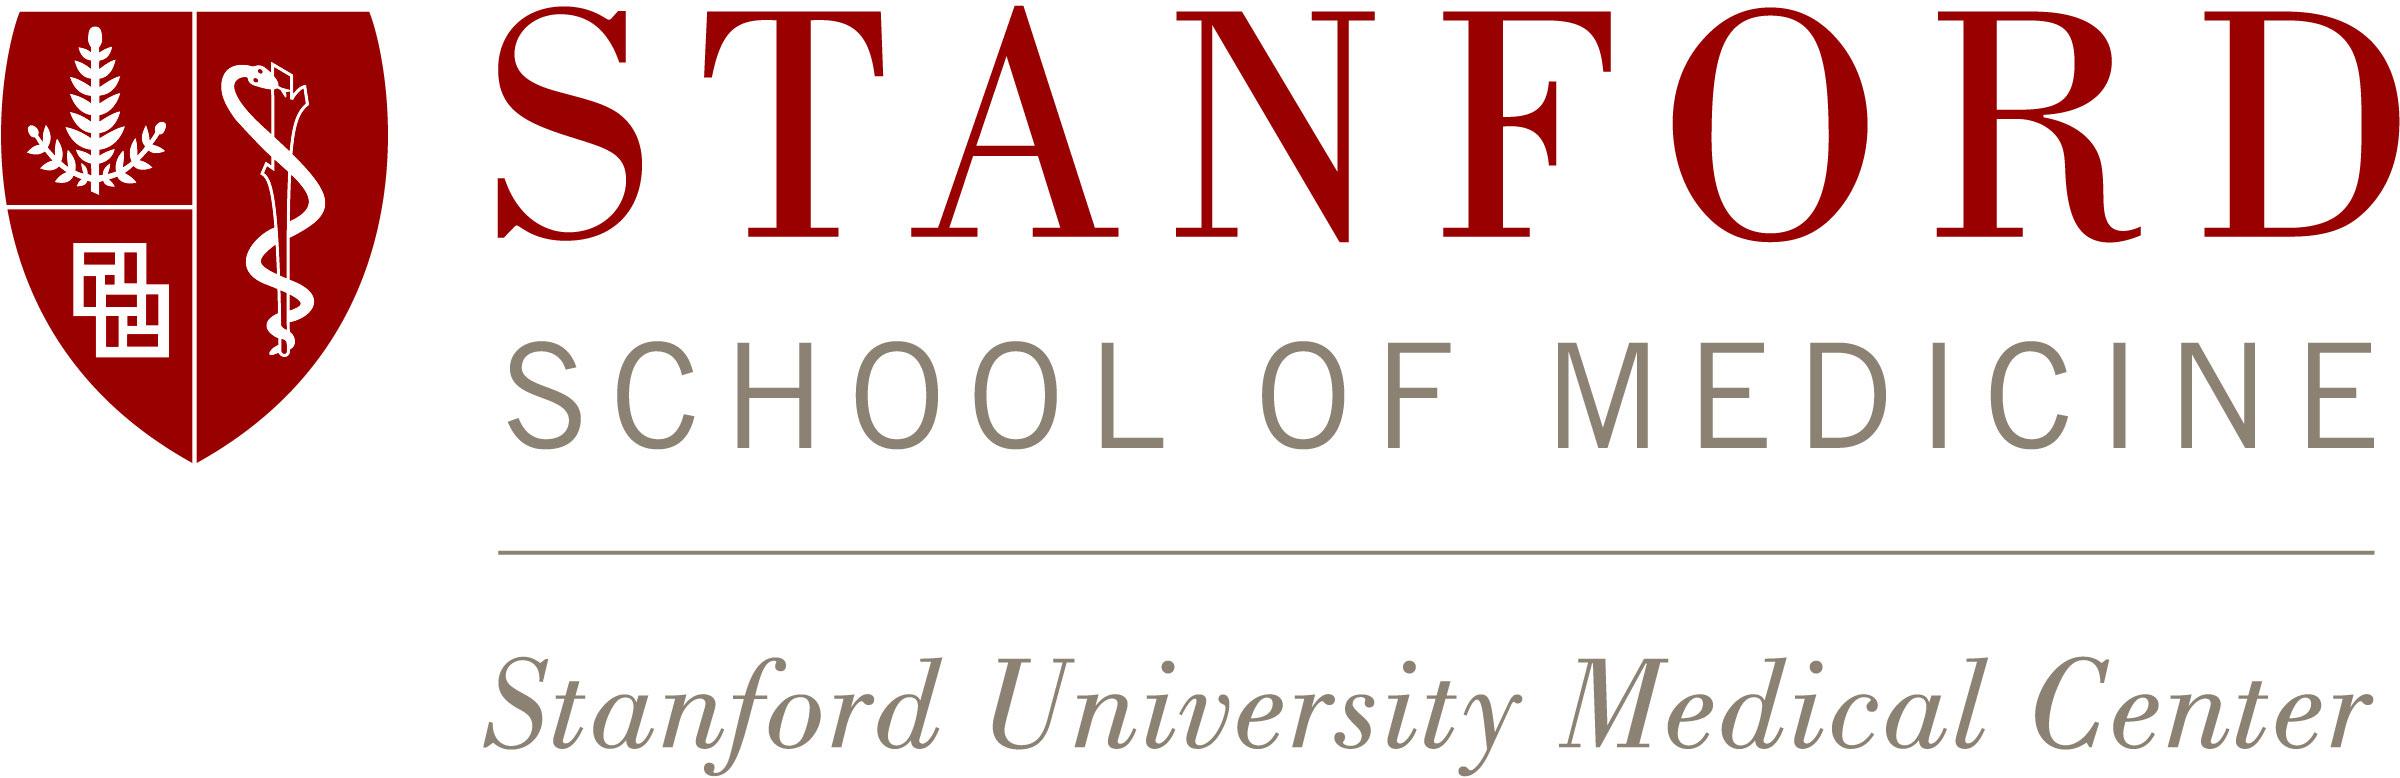 Stanford_School_of_Medicine_Logo.jpg